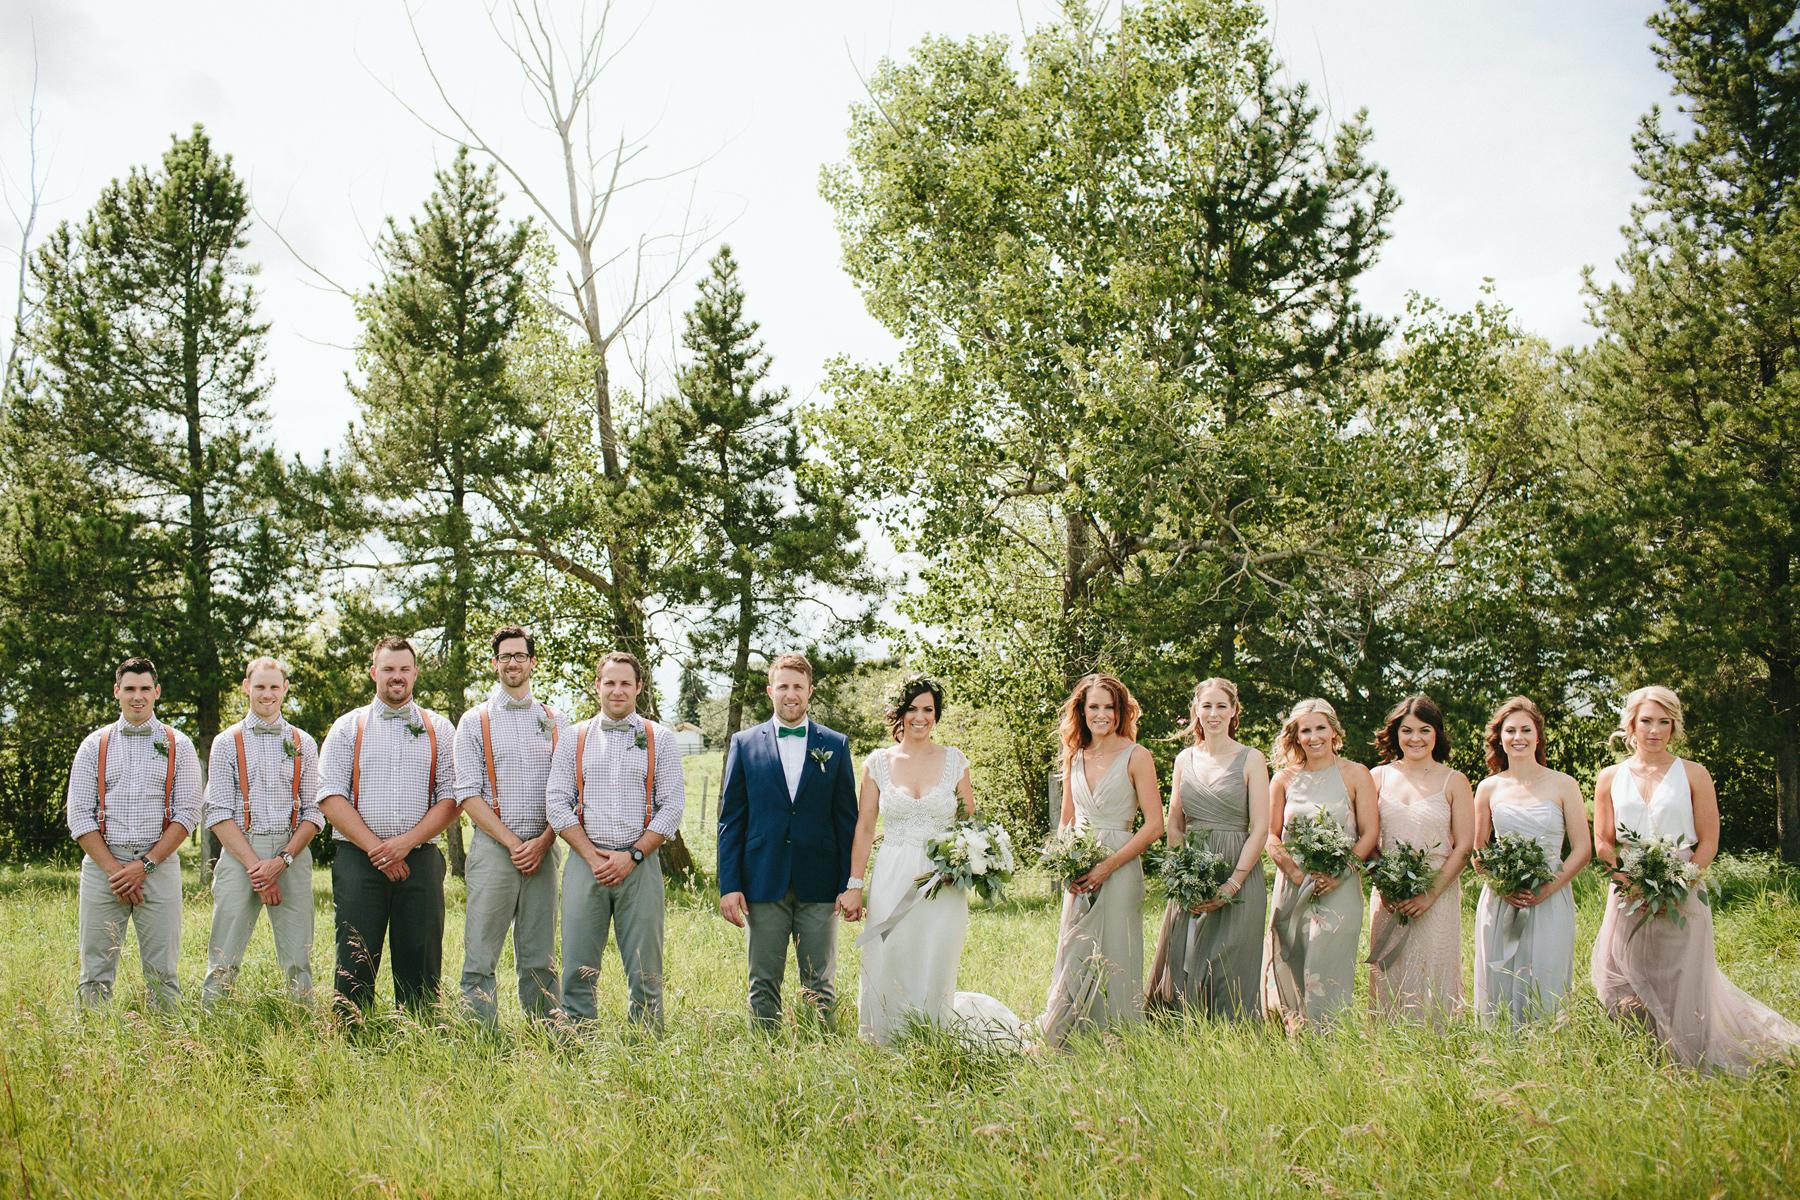 alberta-farm-wedding-photographer-rp-wj-061.jpg